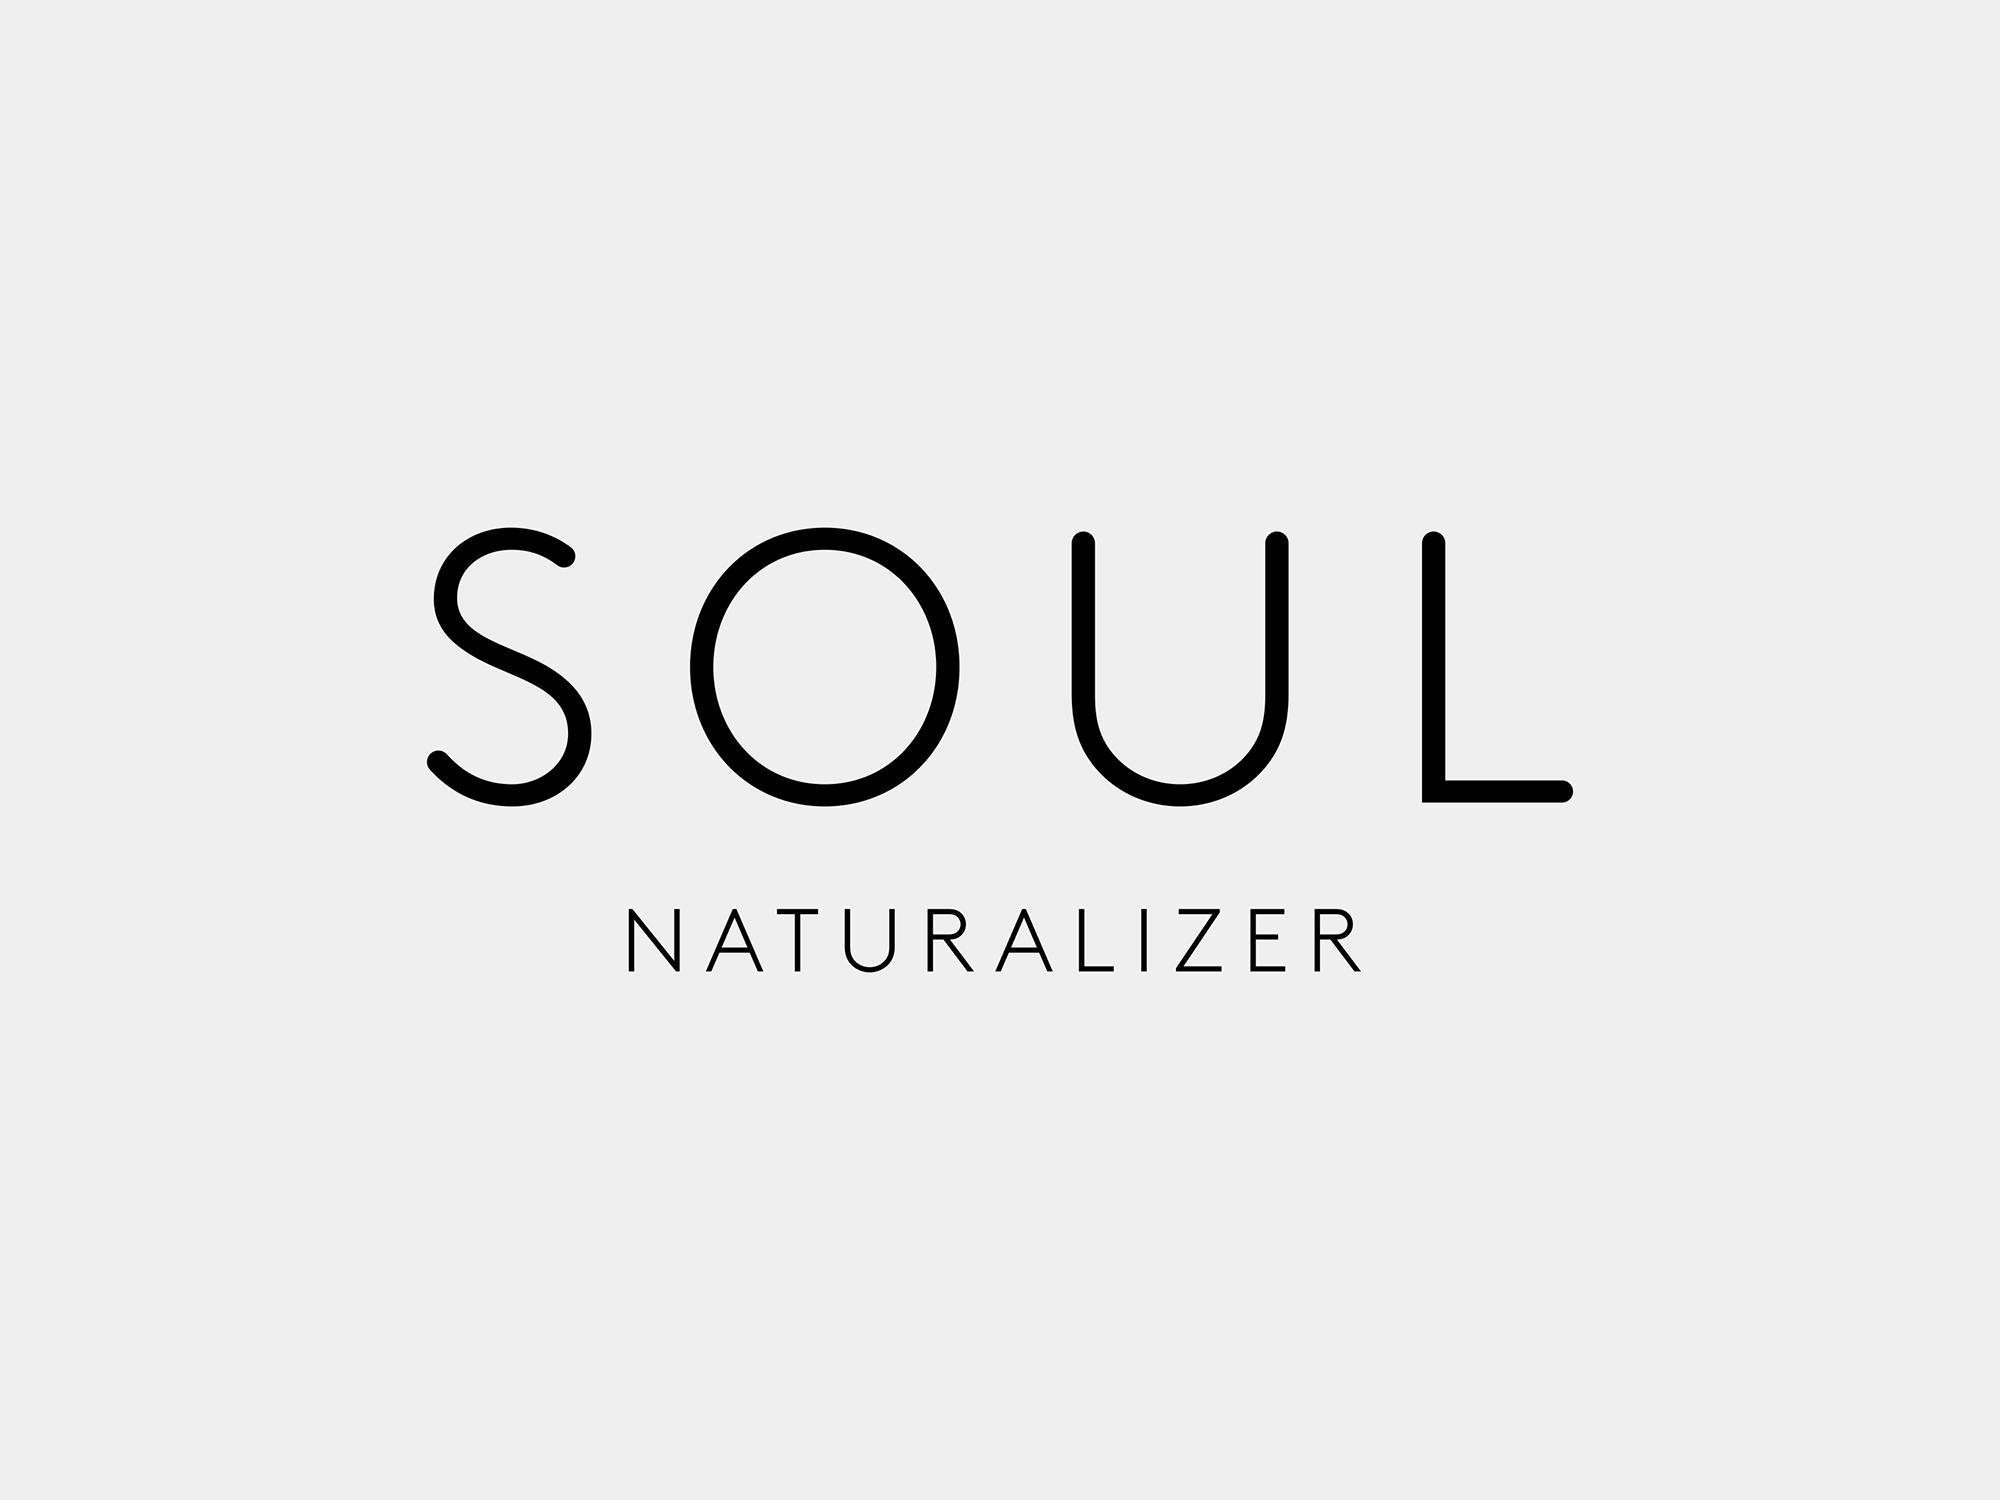 Soul, Naturalizer